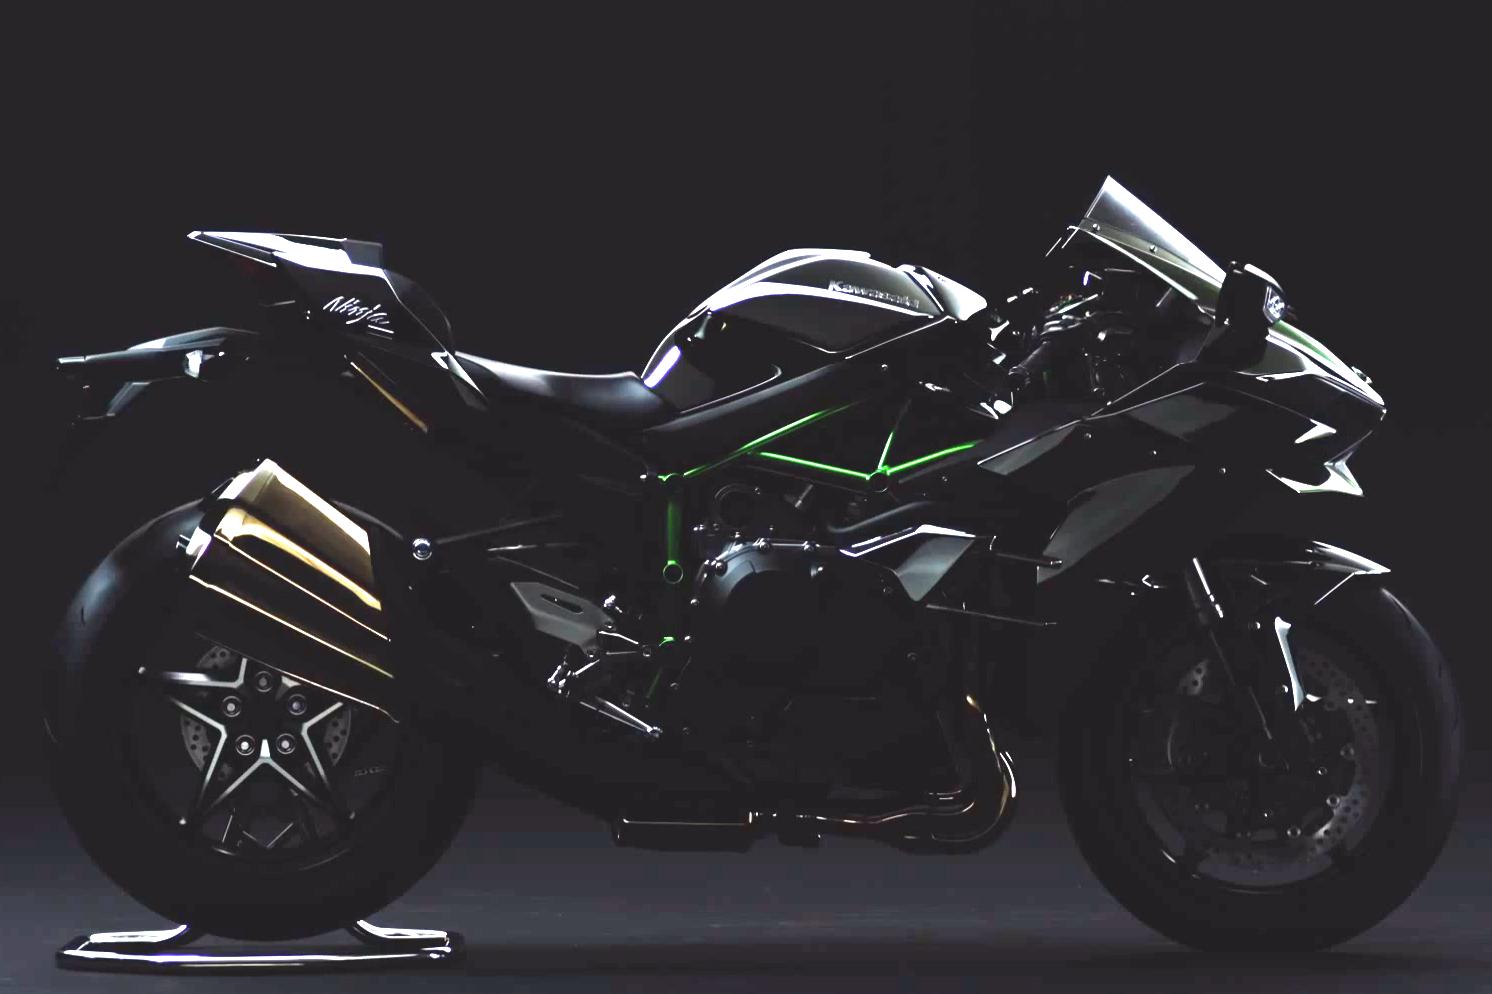 Road-legal Kawasaki Ninja H2 revealed